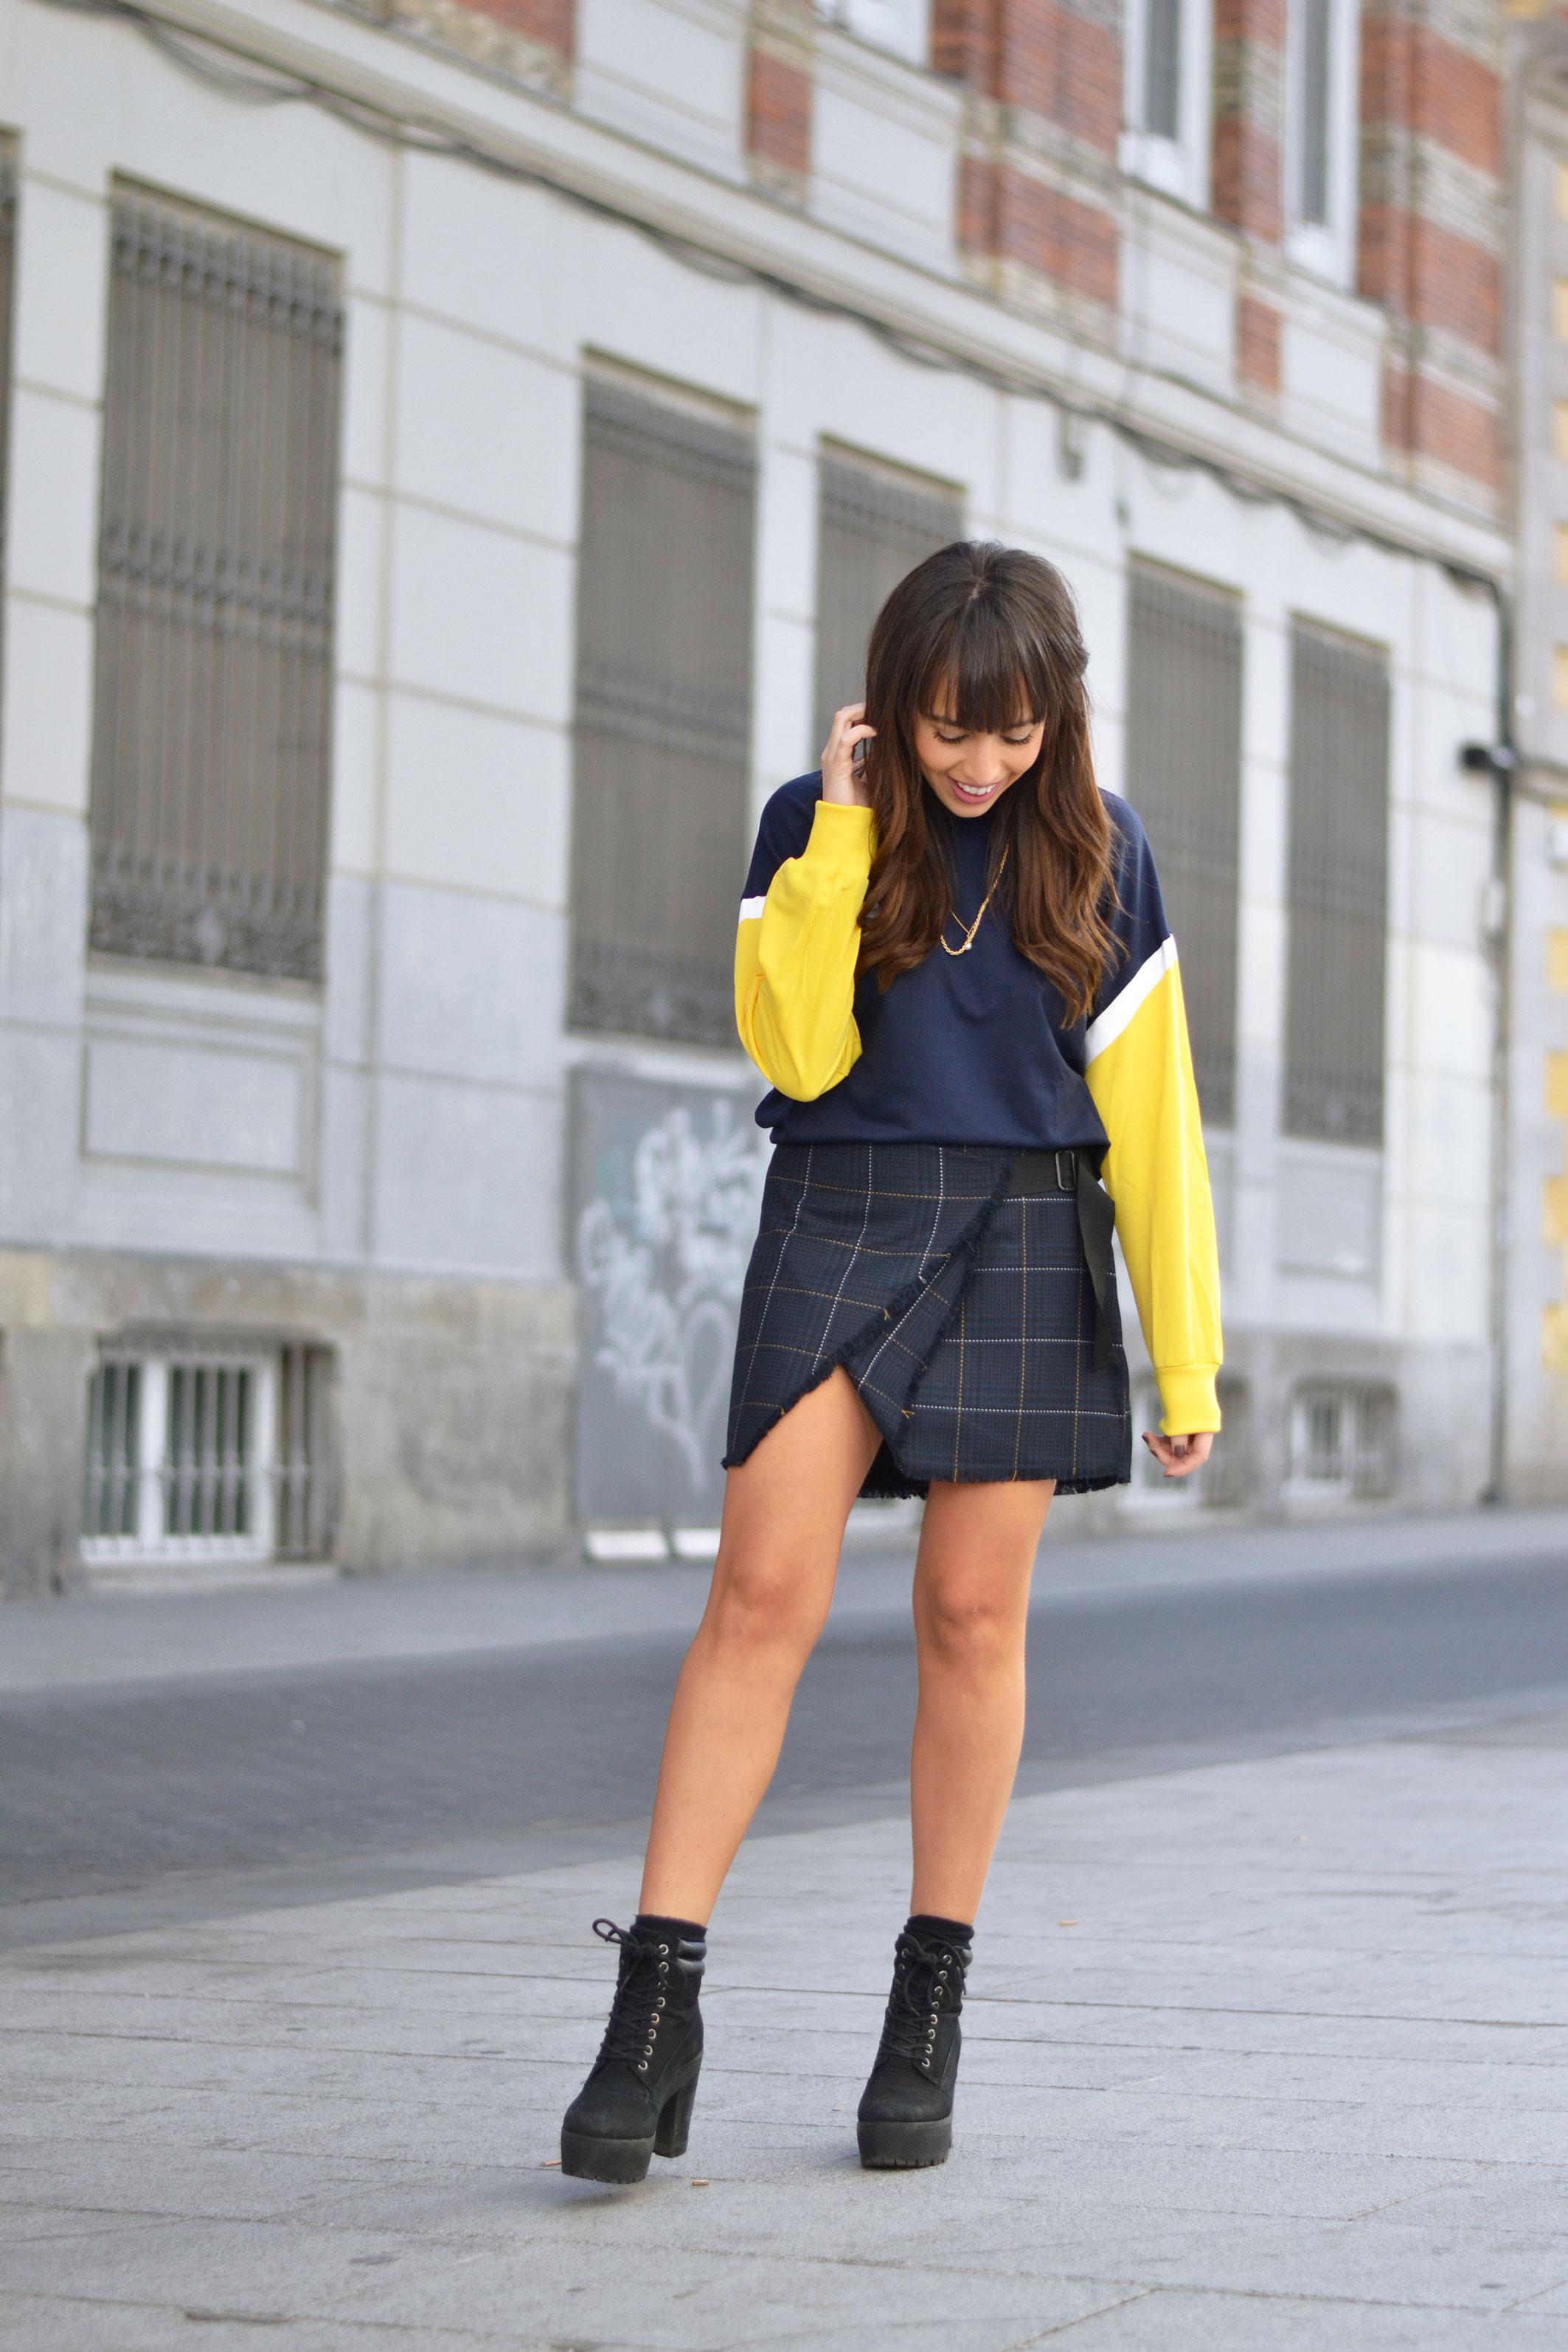 collegue style, cheked skirt, sweatshirt, street style